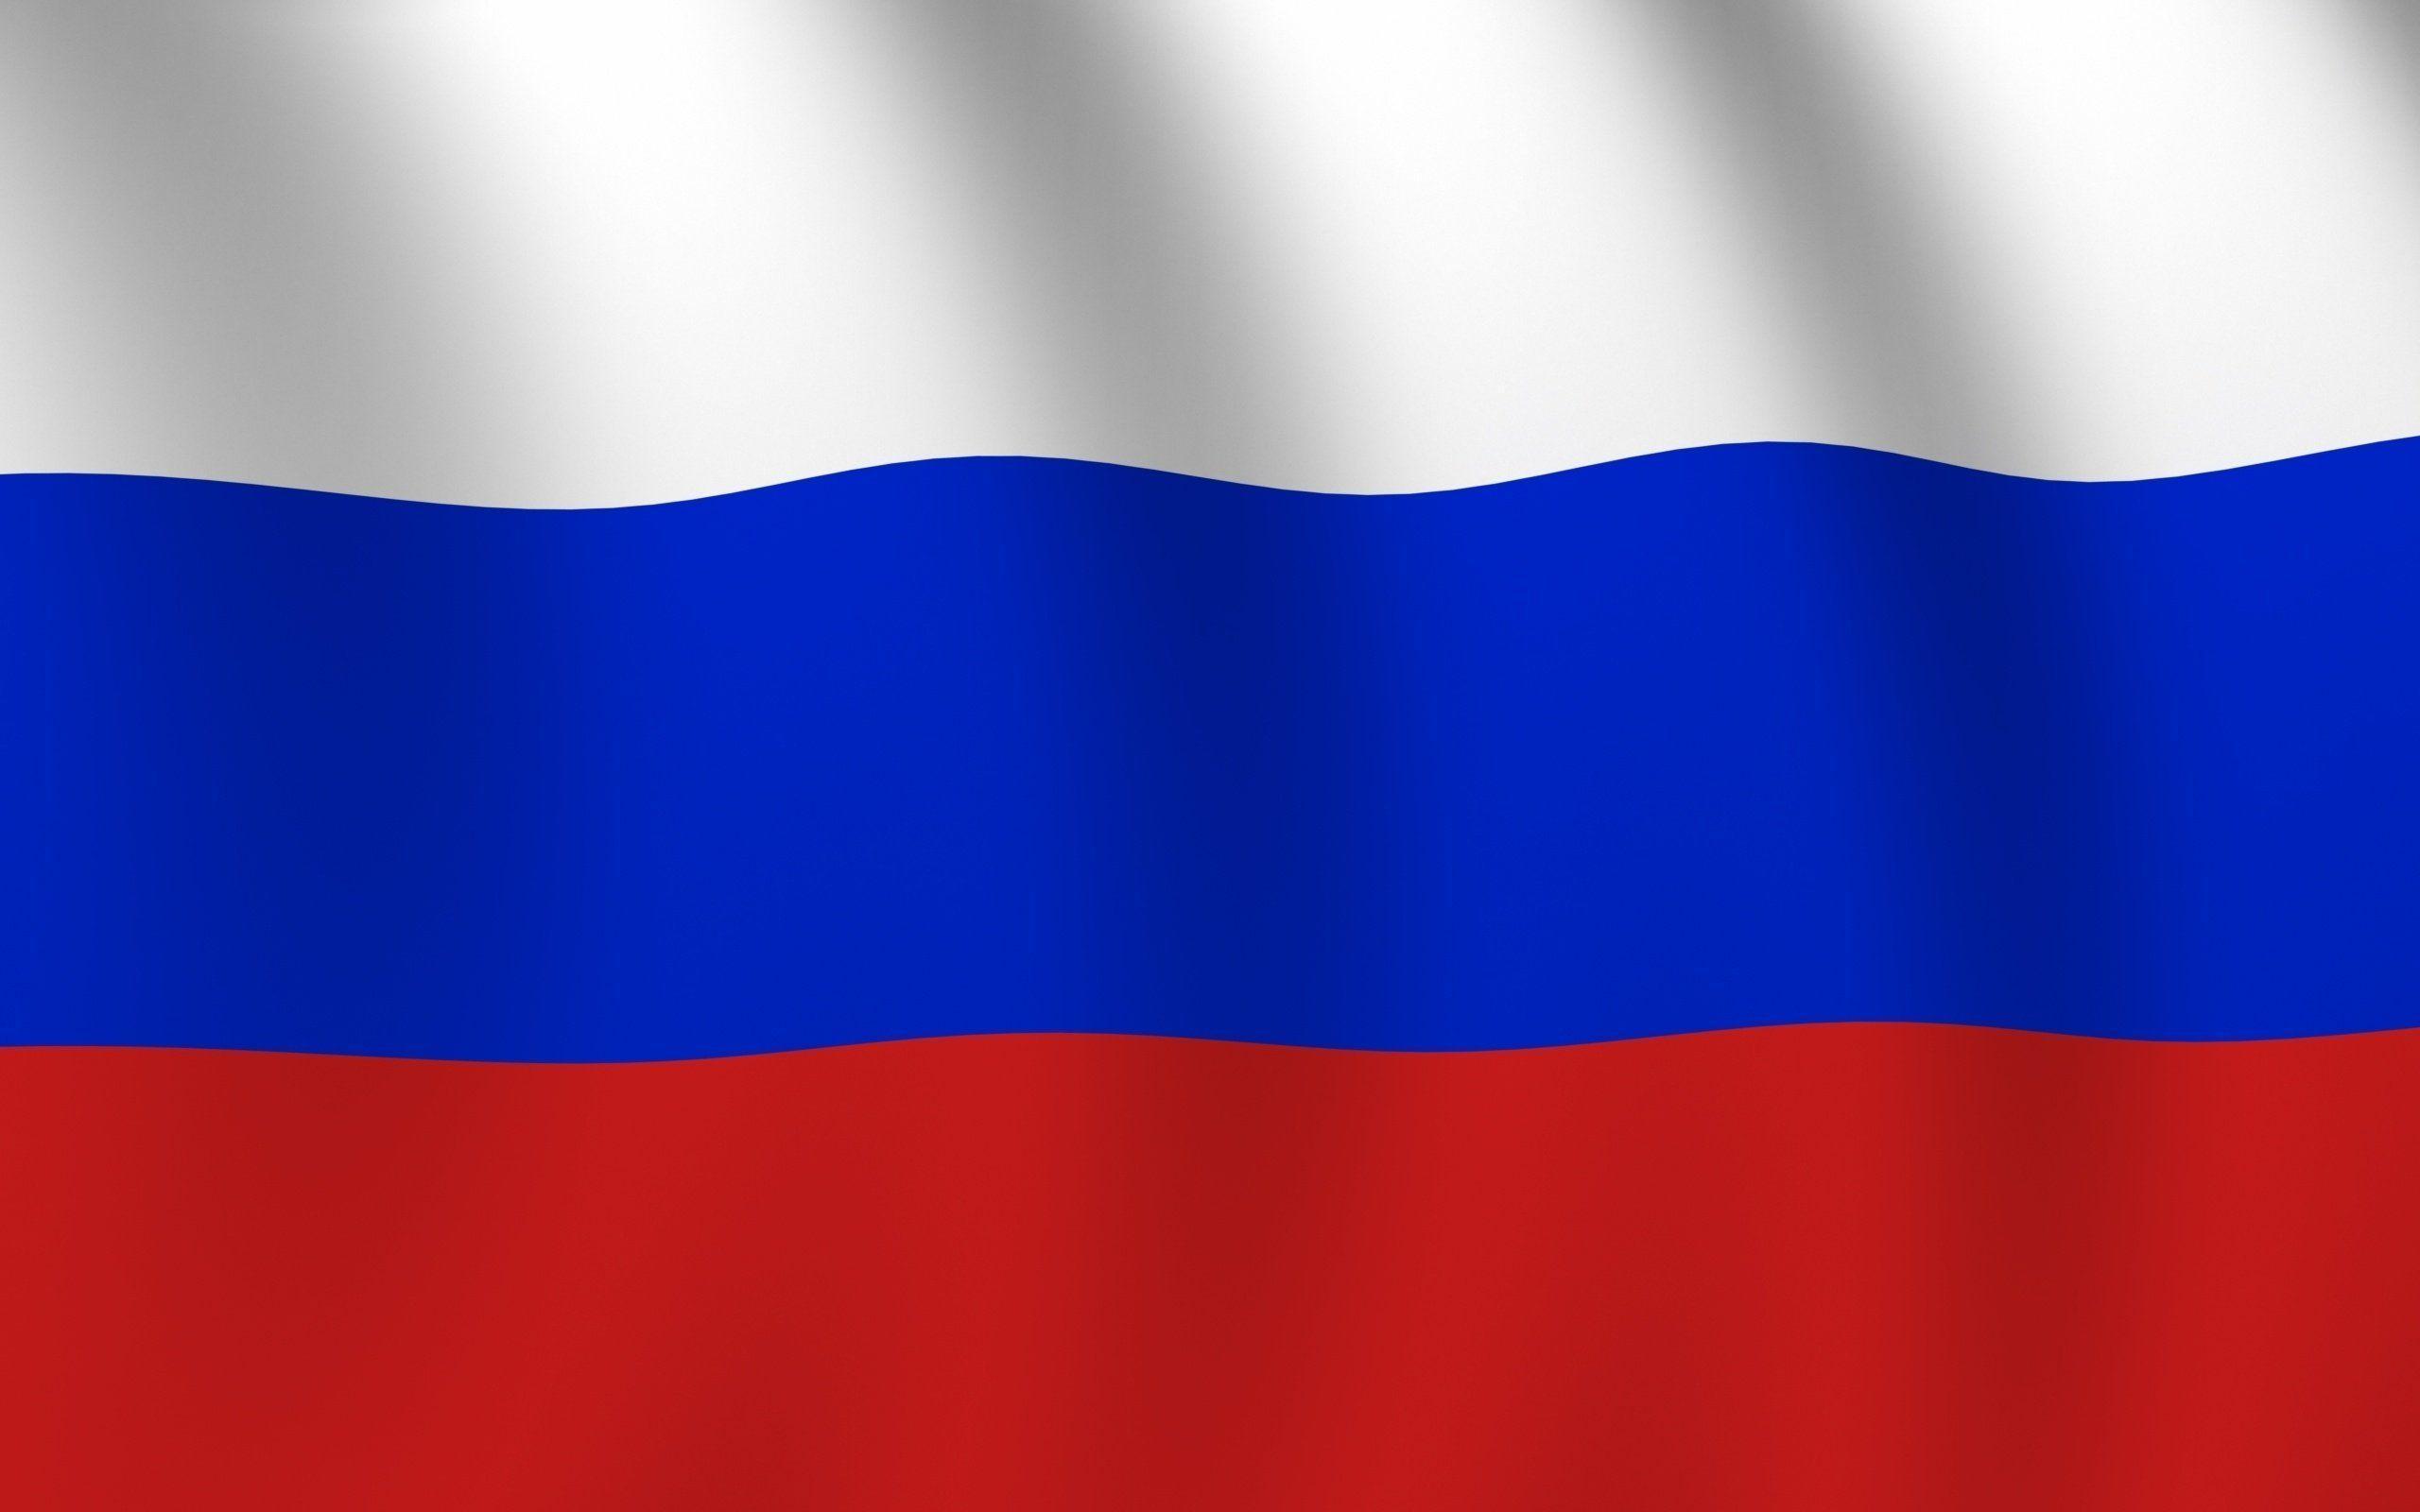 Russian Flag Wallpapers - Wallpaper Cave